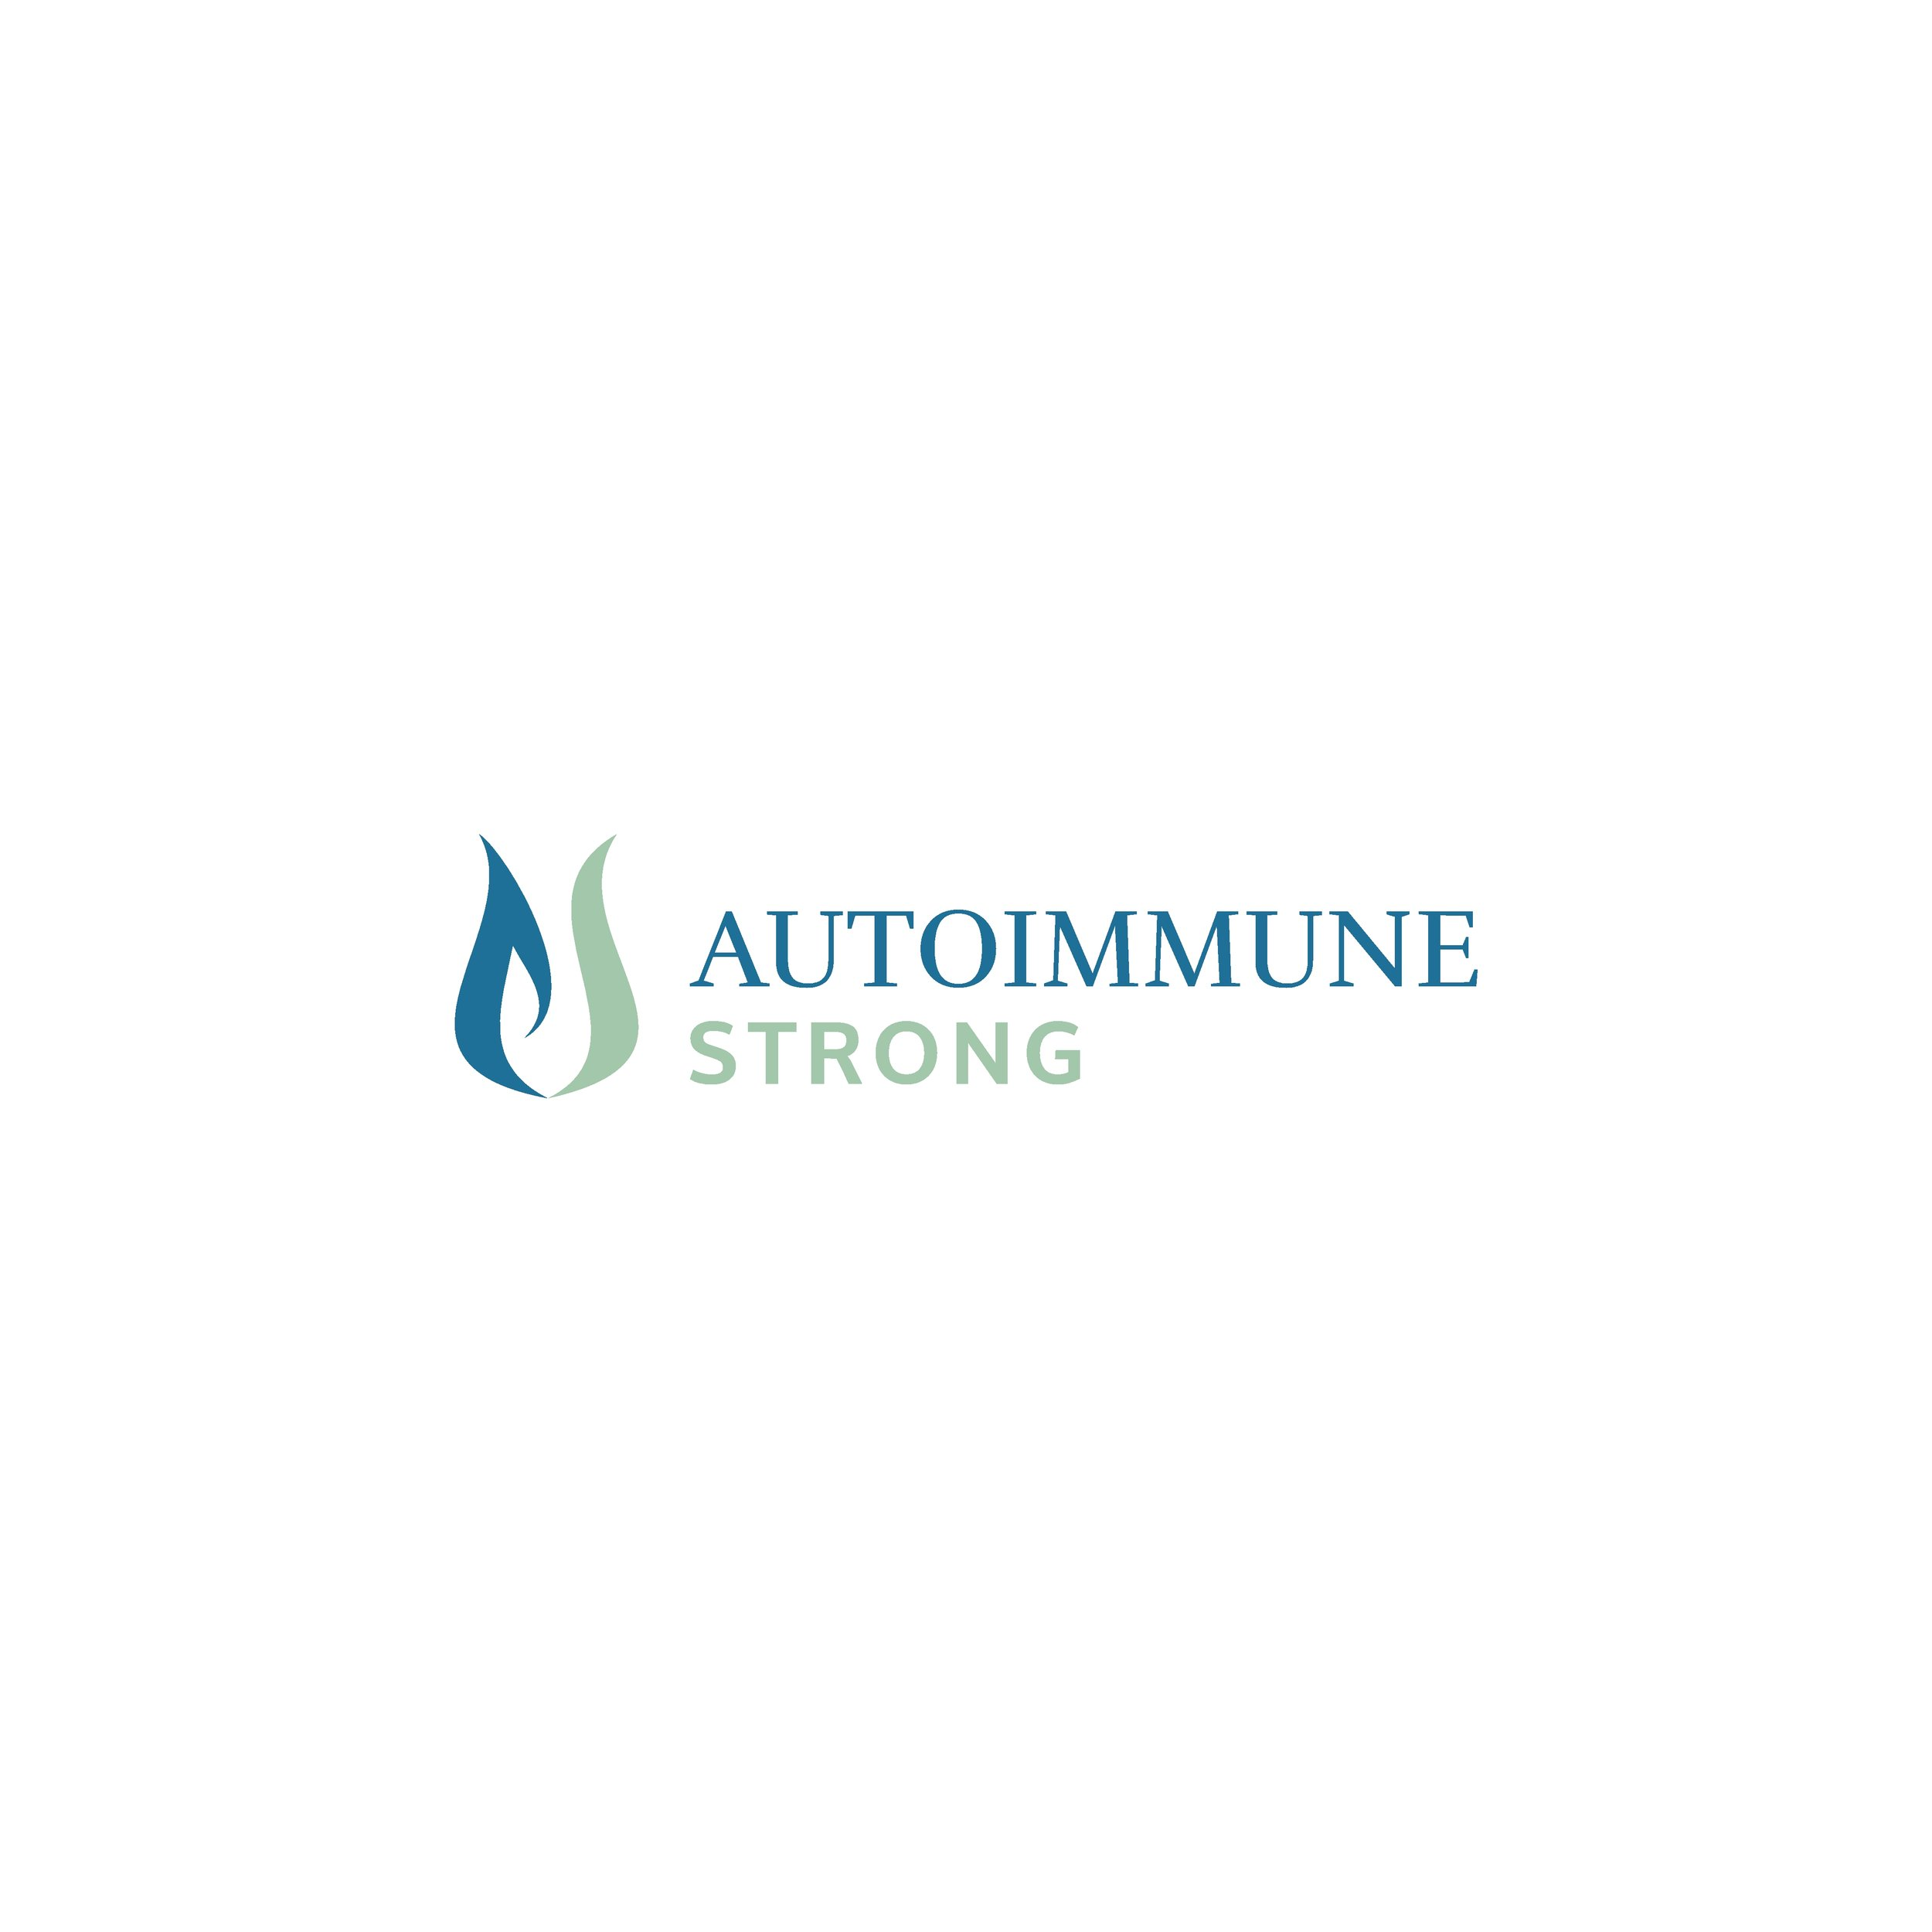 Autoimmune Strong Horizontal RGB.jpg